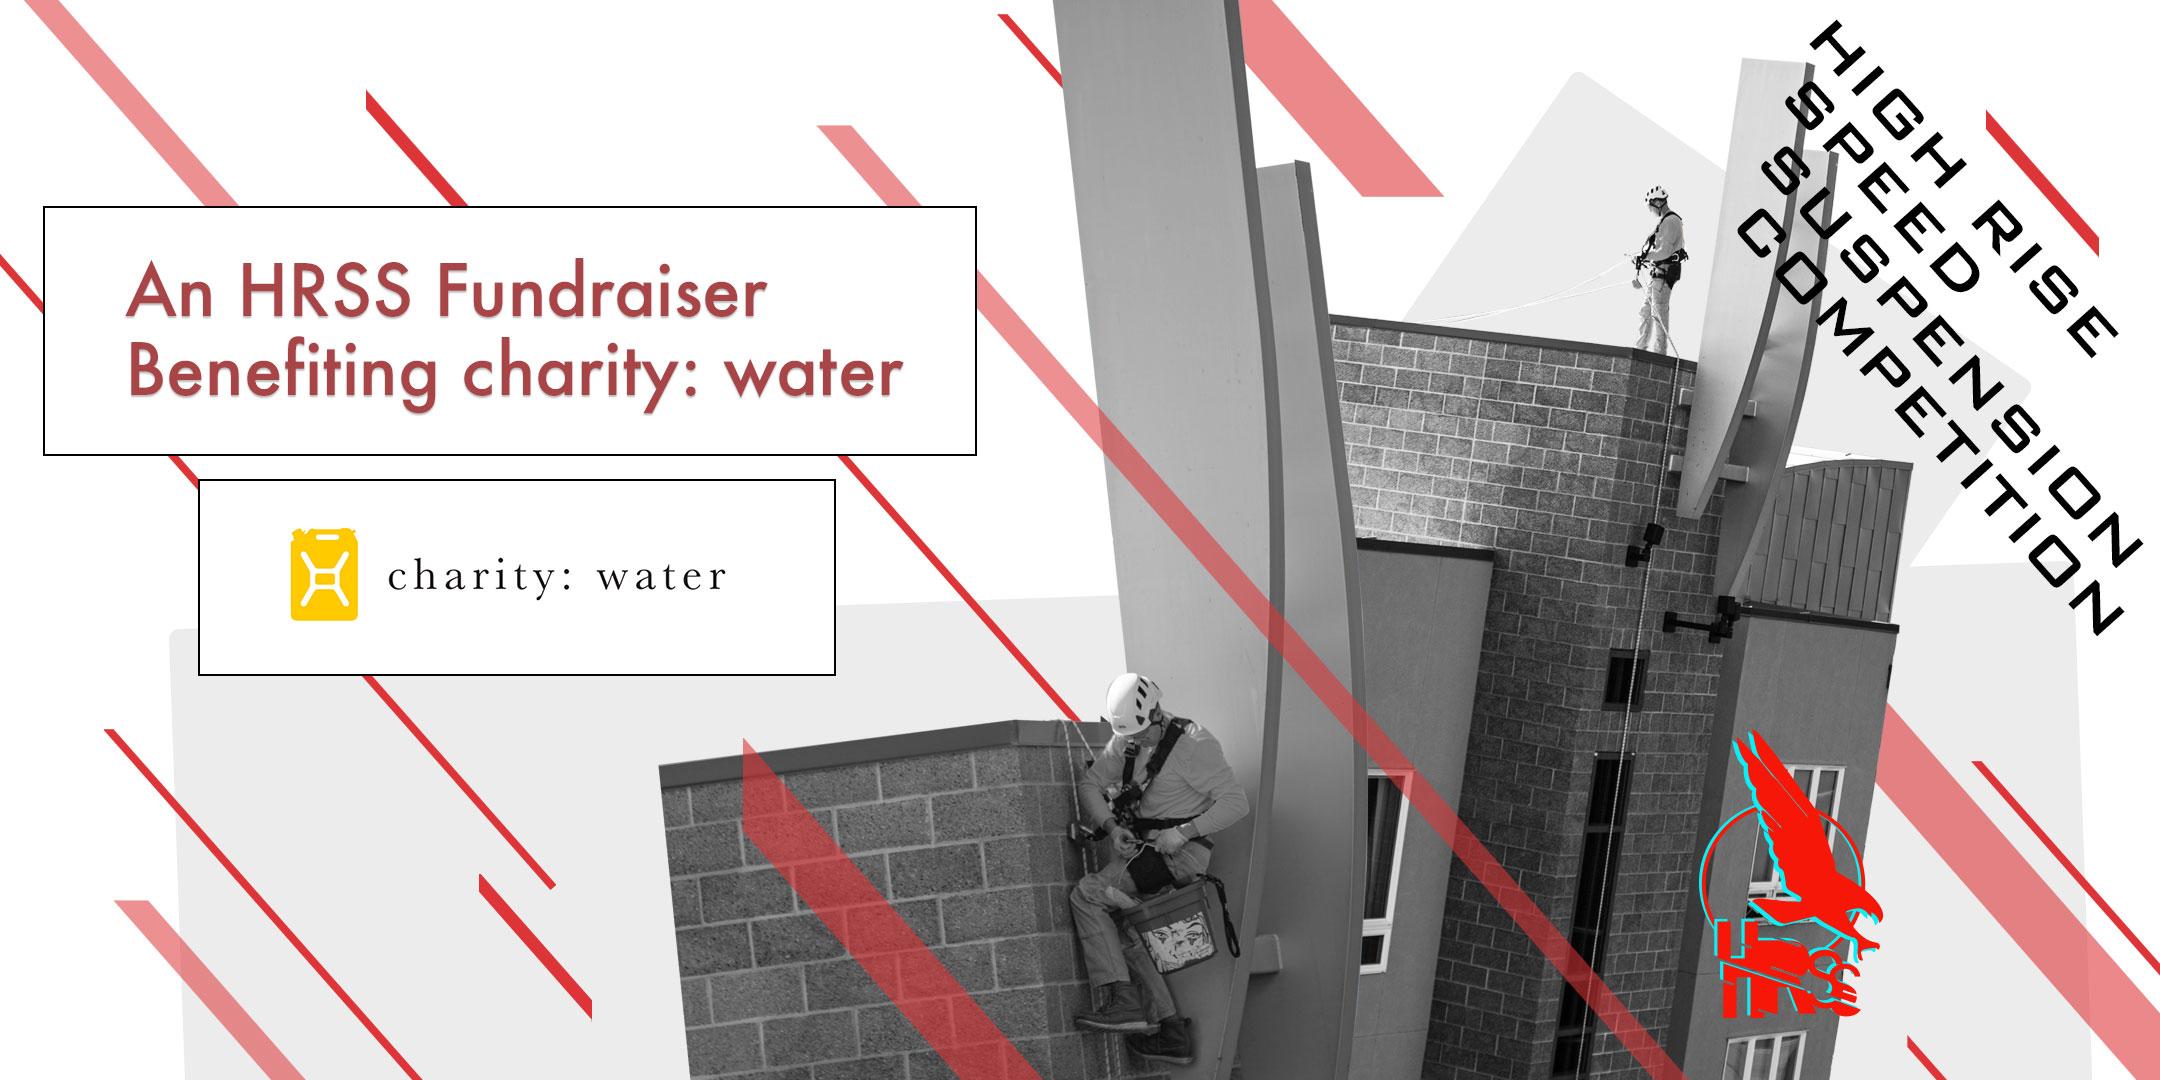 hero-image-watercharity-2160x1080.jpg